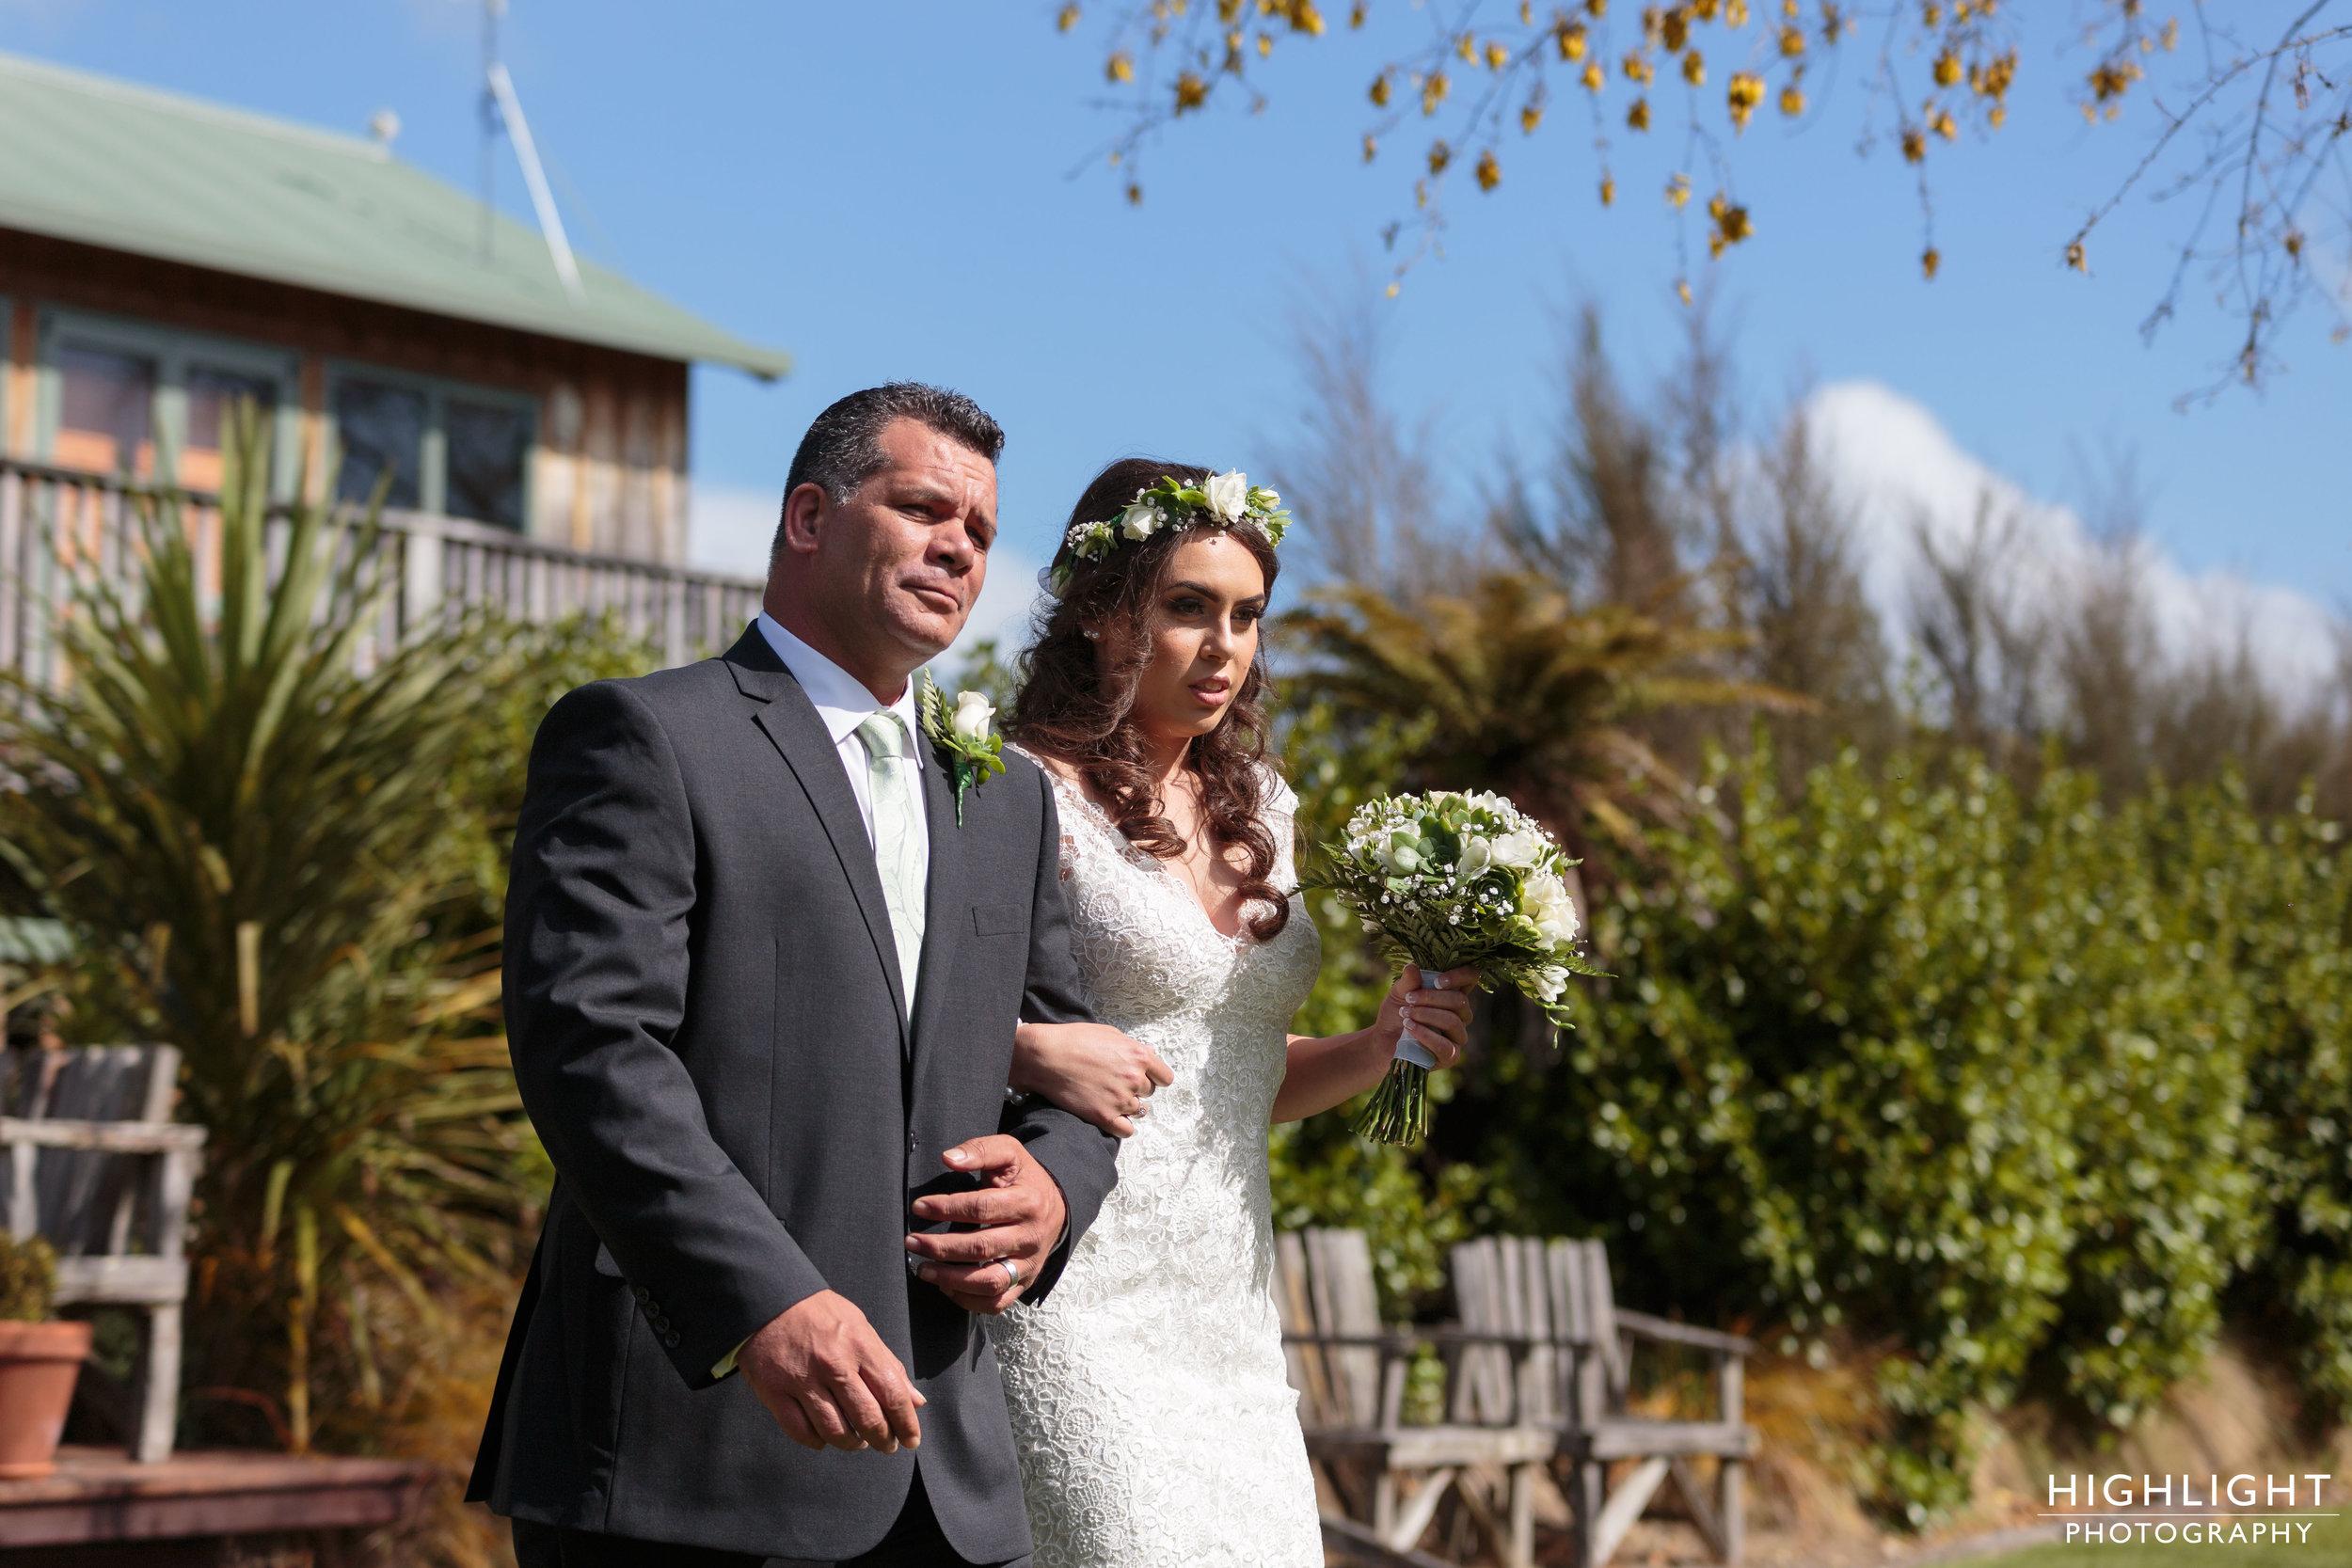 highlight_wedding_photography_makoura_lodge_manawatu_new_zealand-63.jpg